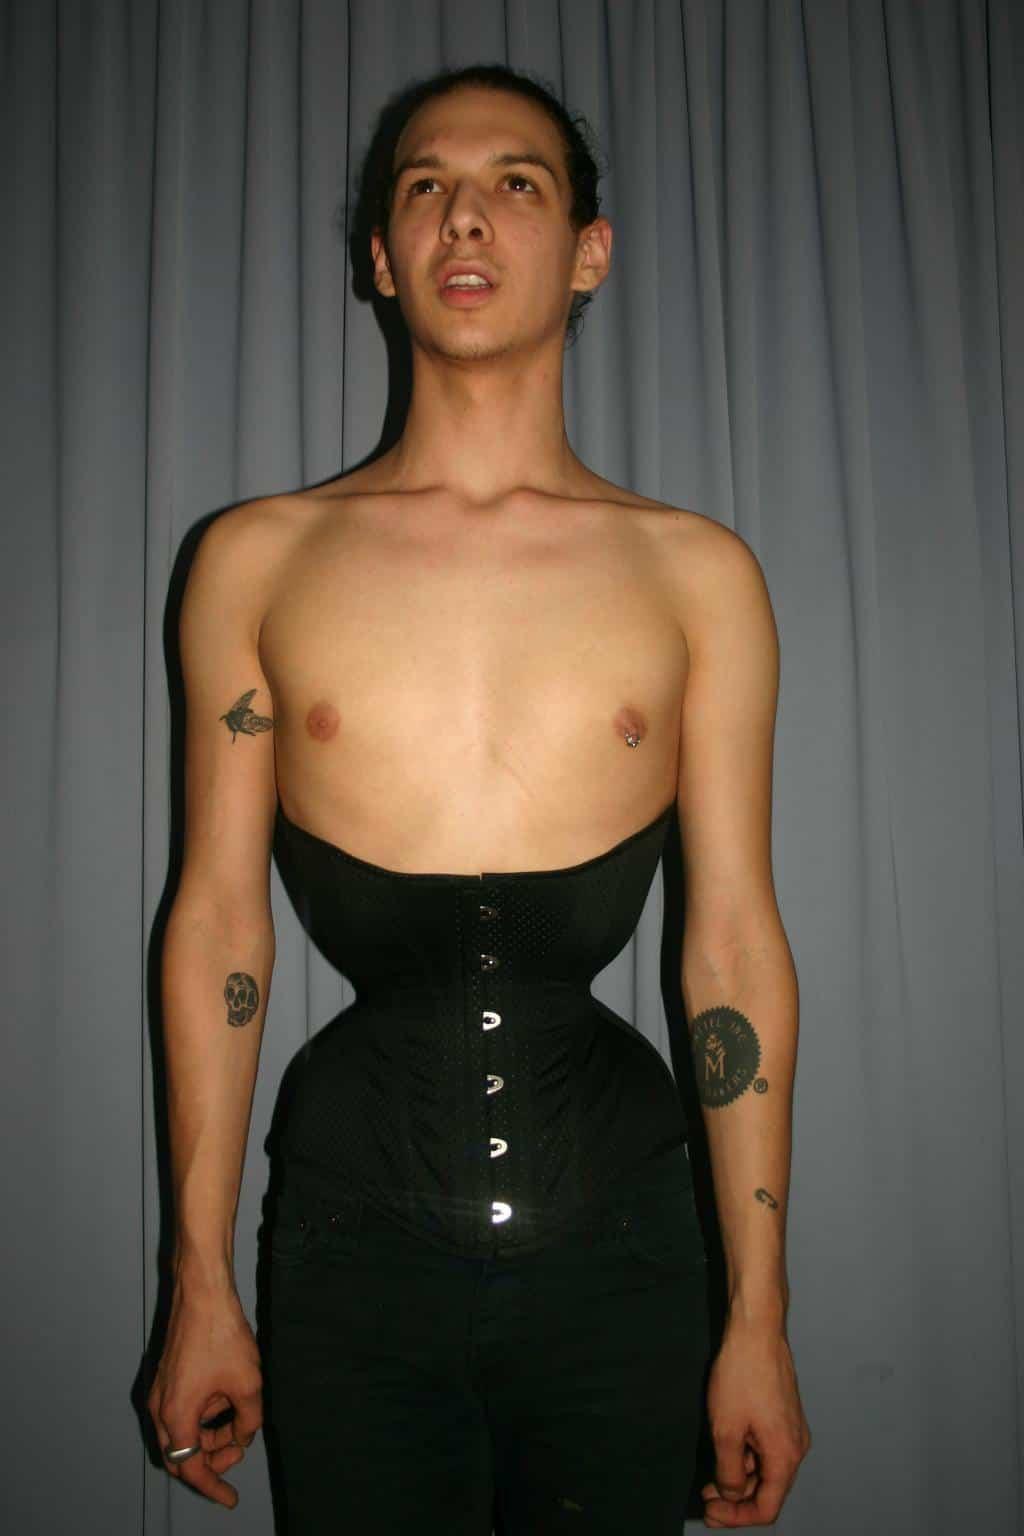 Extrem Small Waist Nudes 49